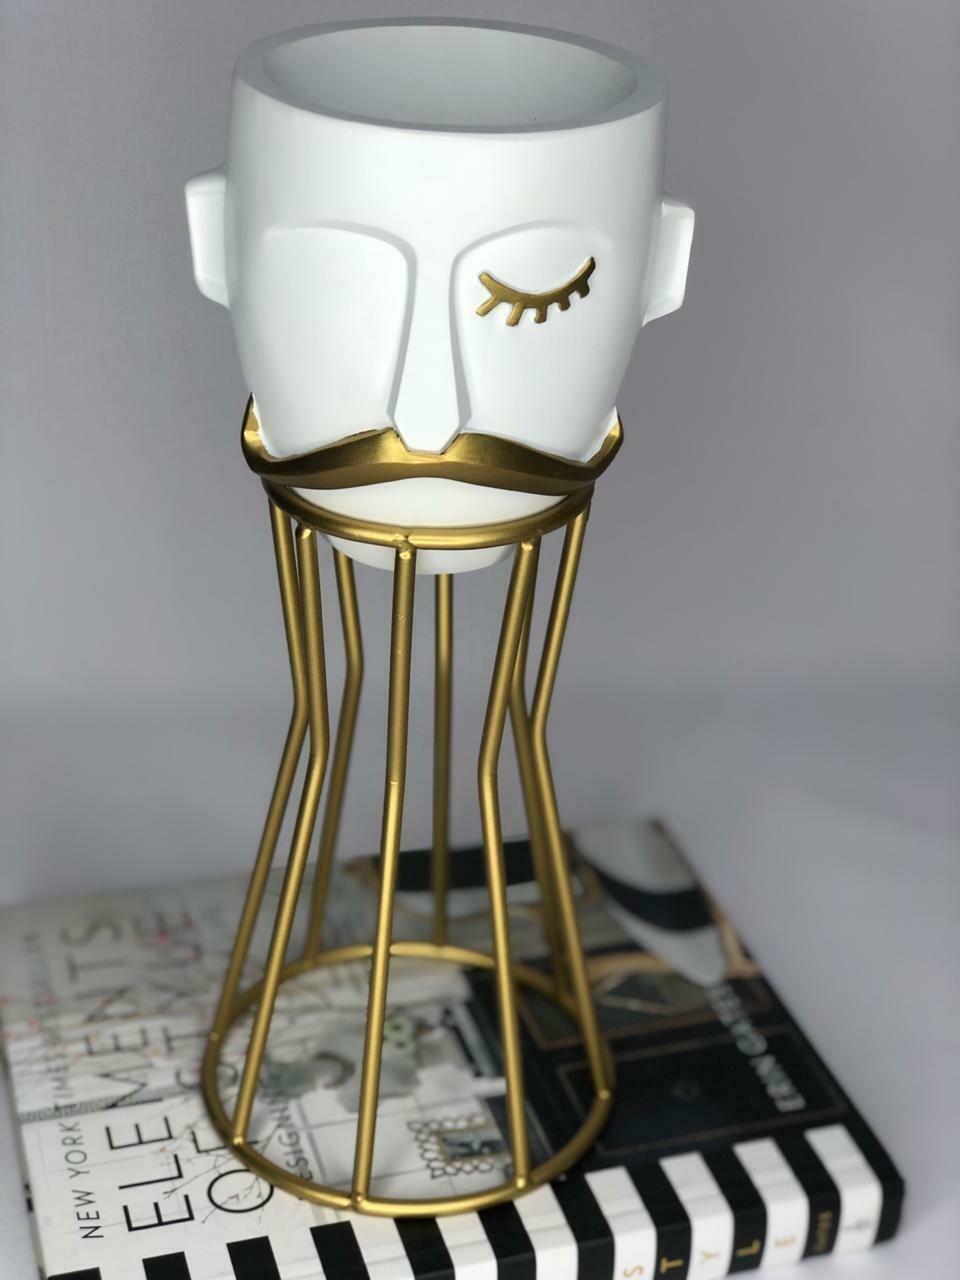 Florero Moustache - Flower Vase